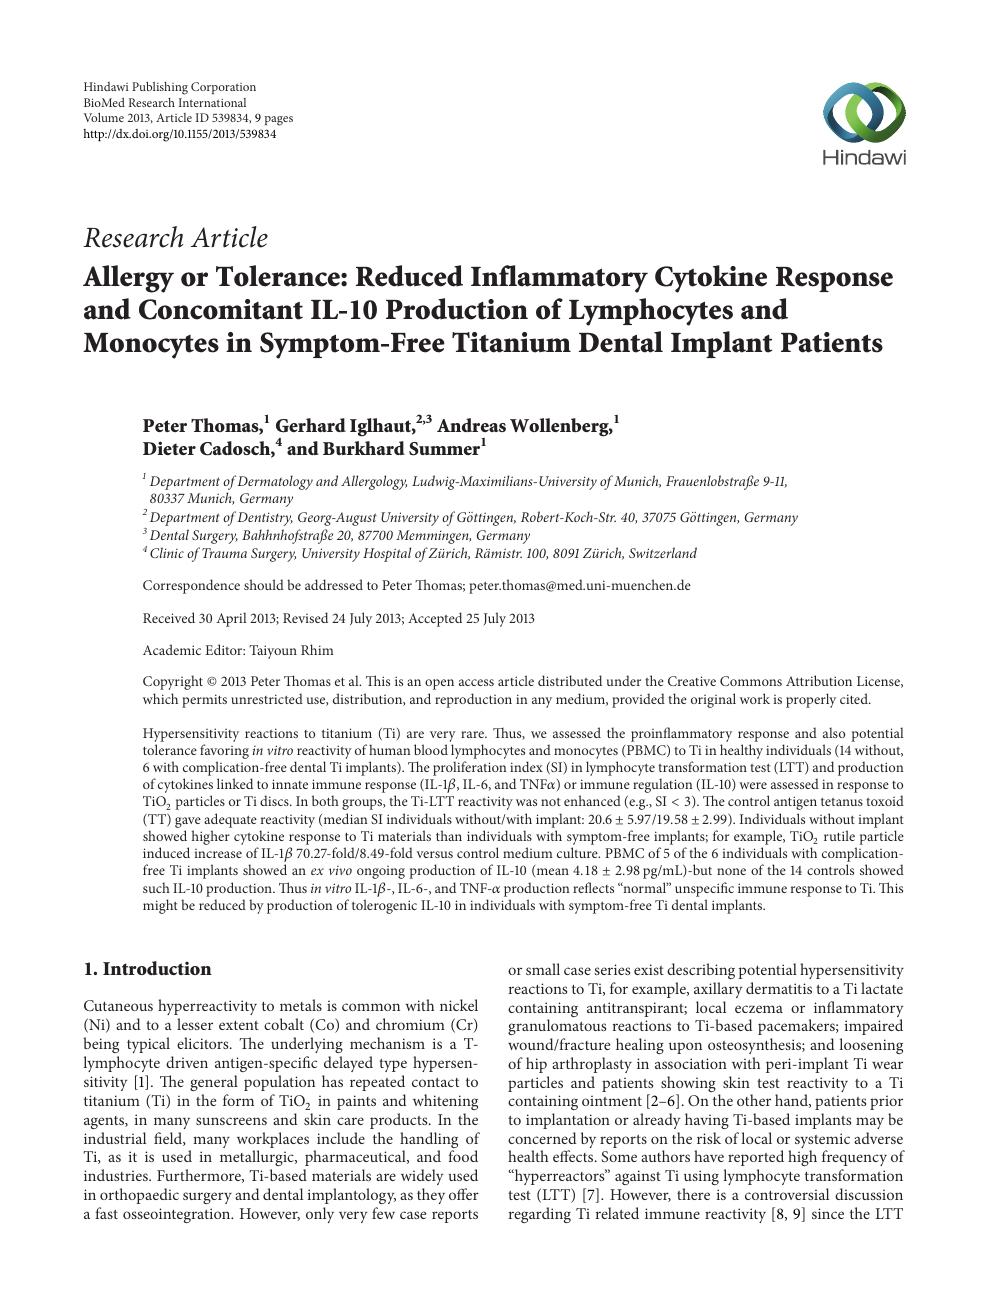 Allergy or Tolerance: Reduced Inflammatory Cytokine Response